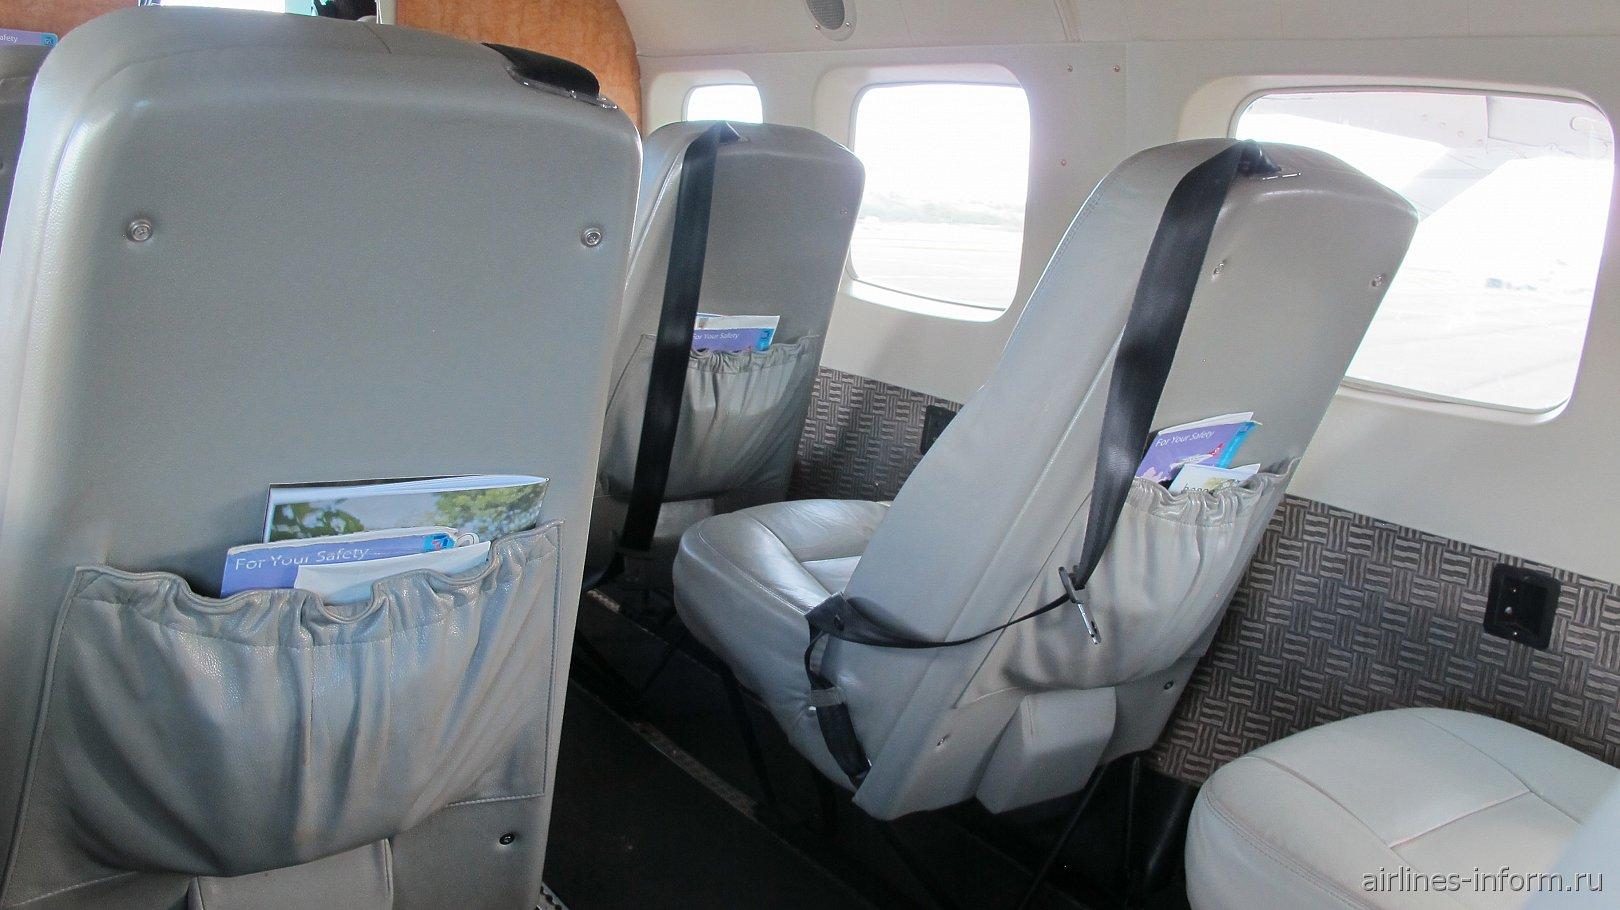 ������������ ������ � �������� Cessna Caravan ������������ Mokulele